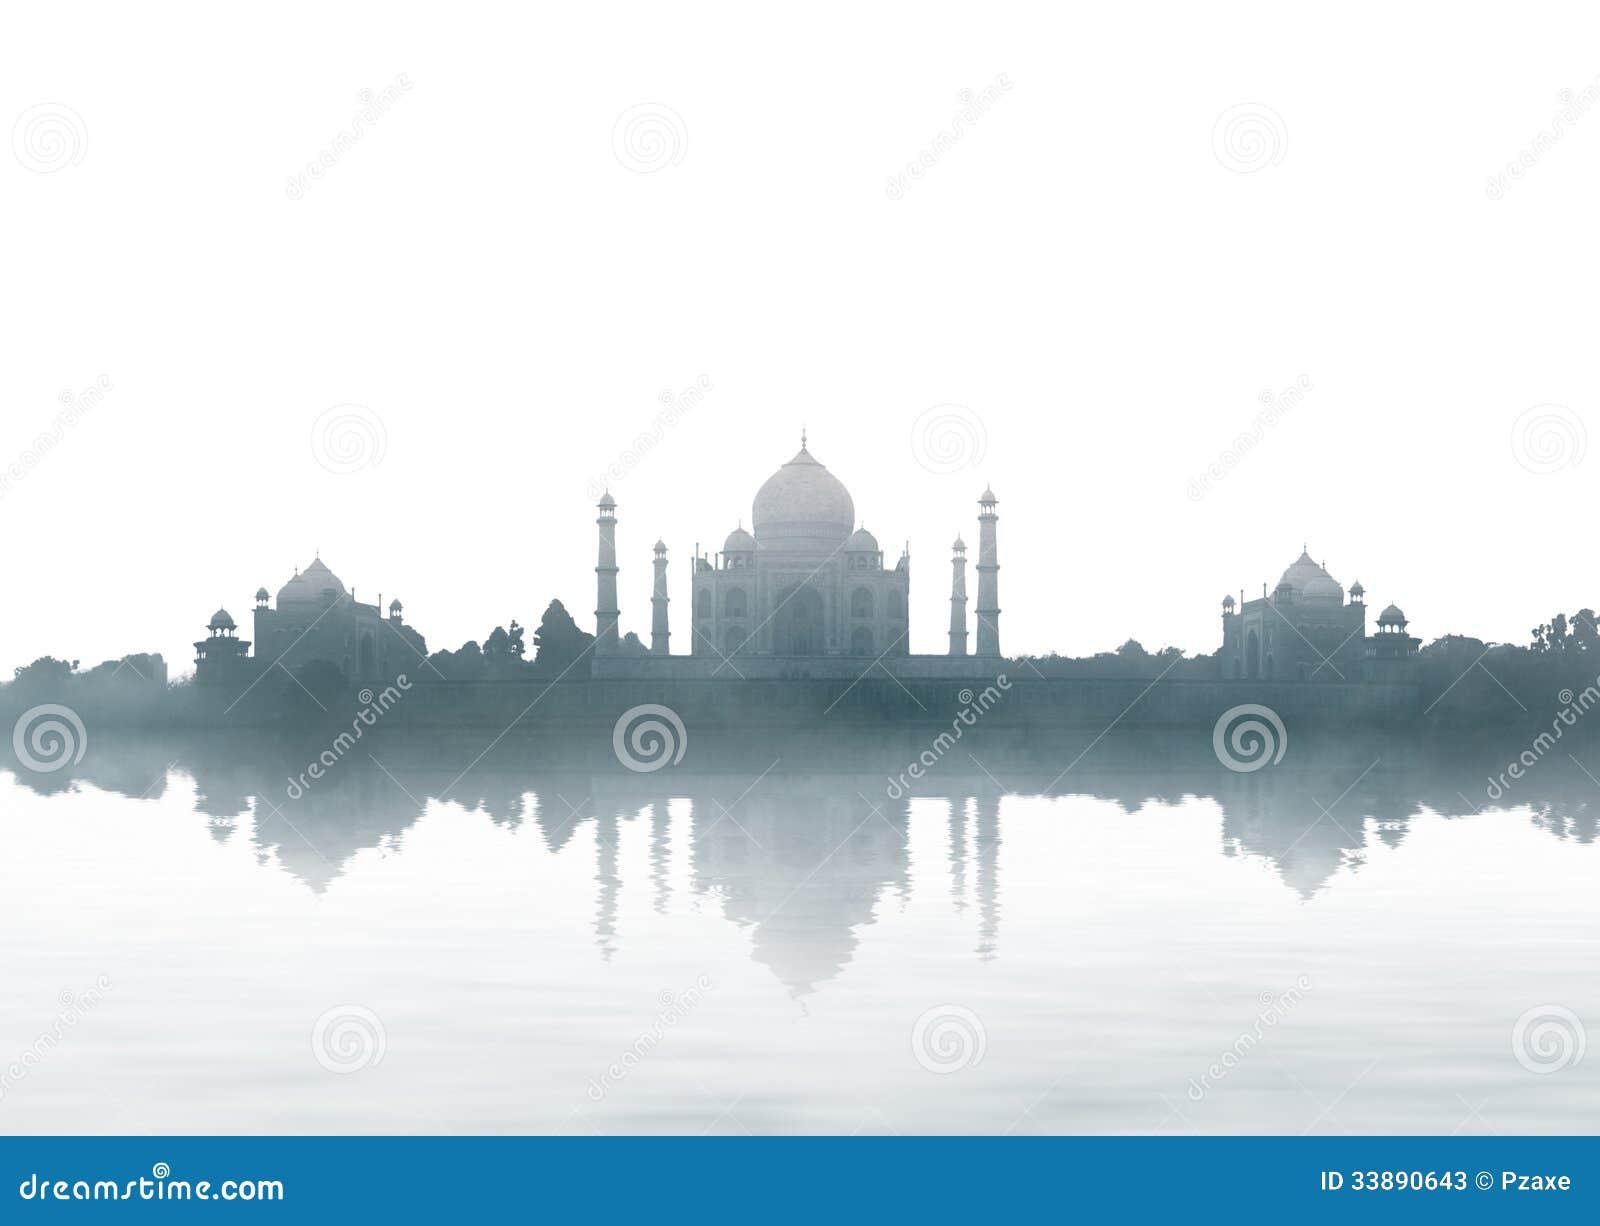 India landmark - Taj Mahal panorama with fog